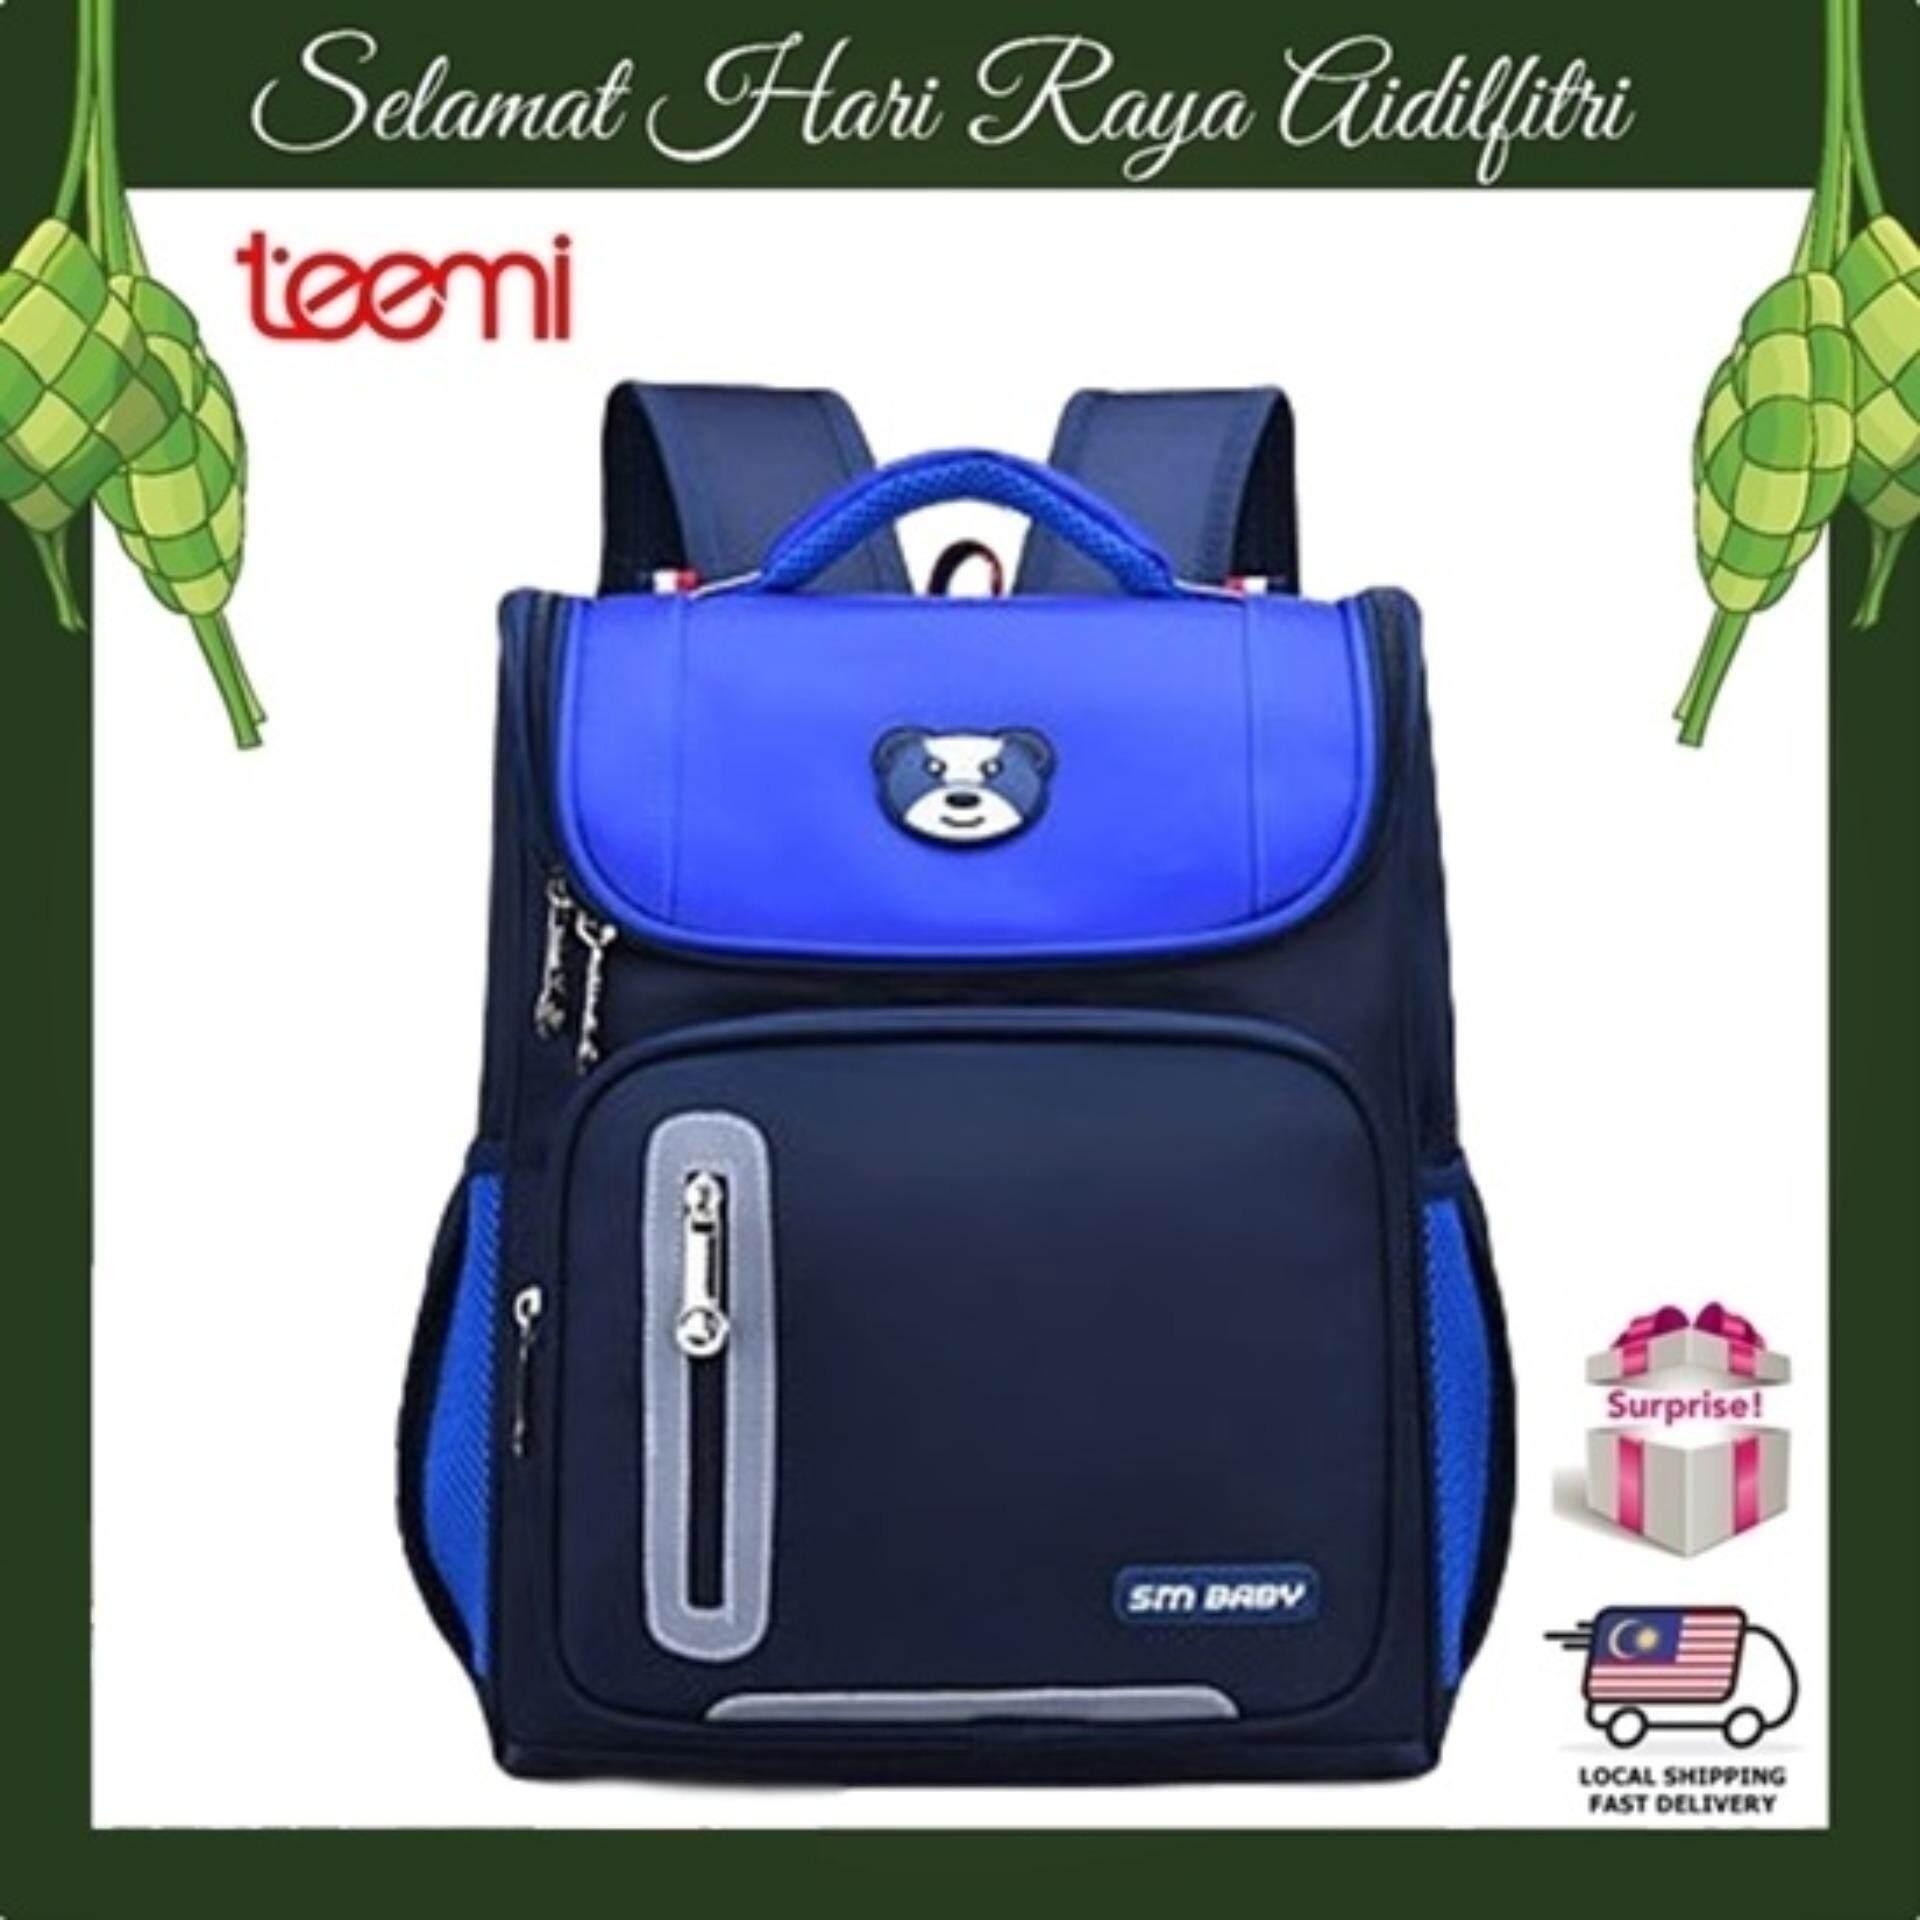 TEEMI Orthopedic Russian Backpack Top Load Water Resistant Star Bear Printing Light Weight Kids Children Primary School Bag - Dark Blue